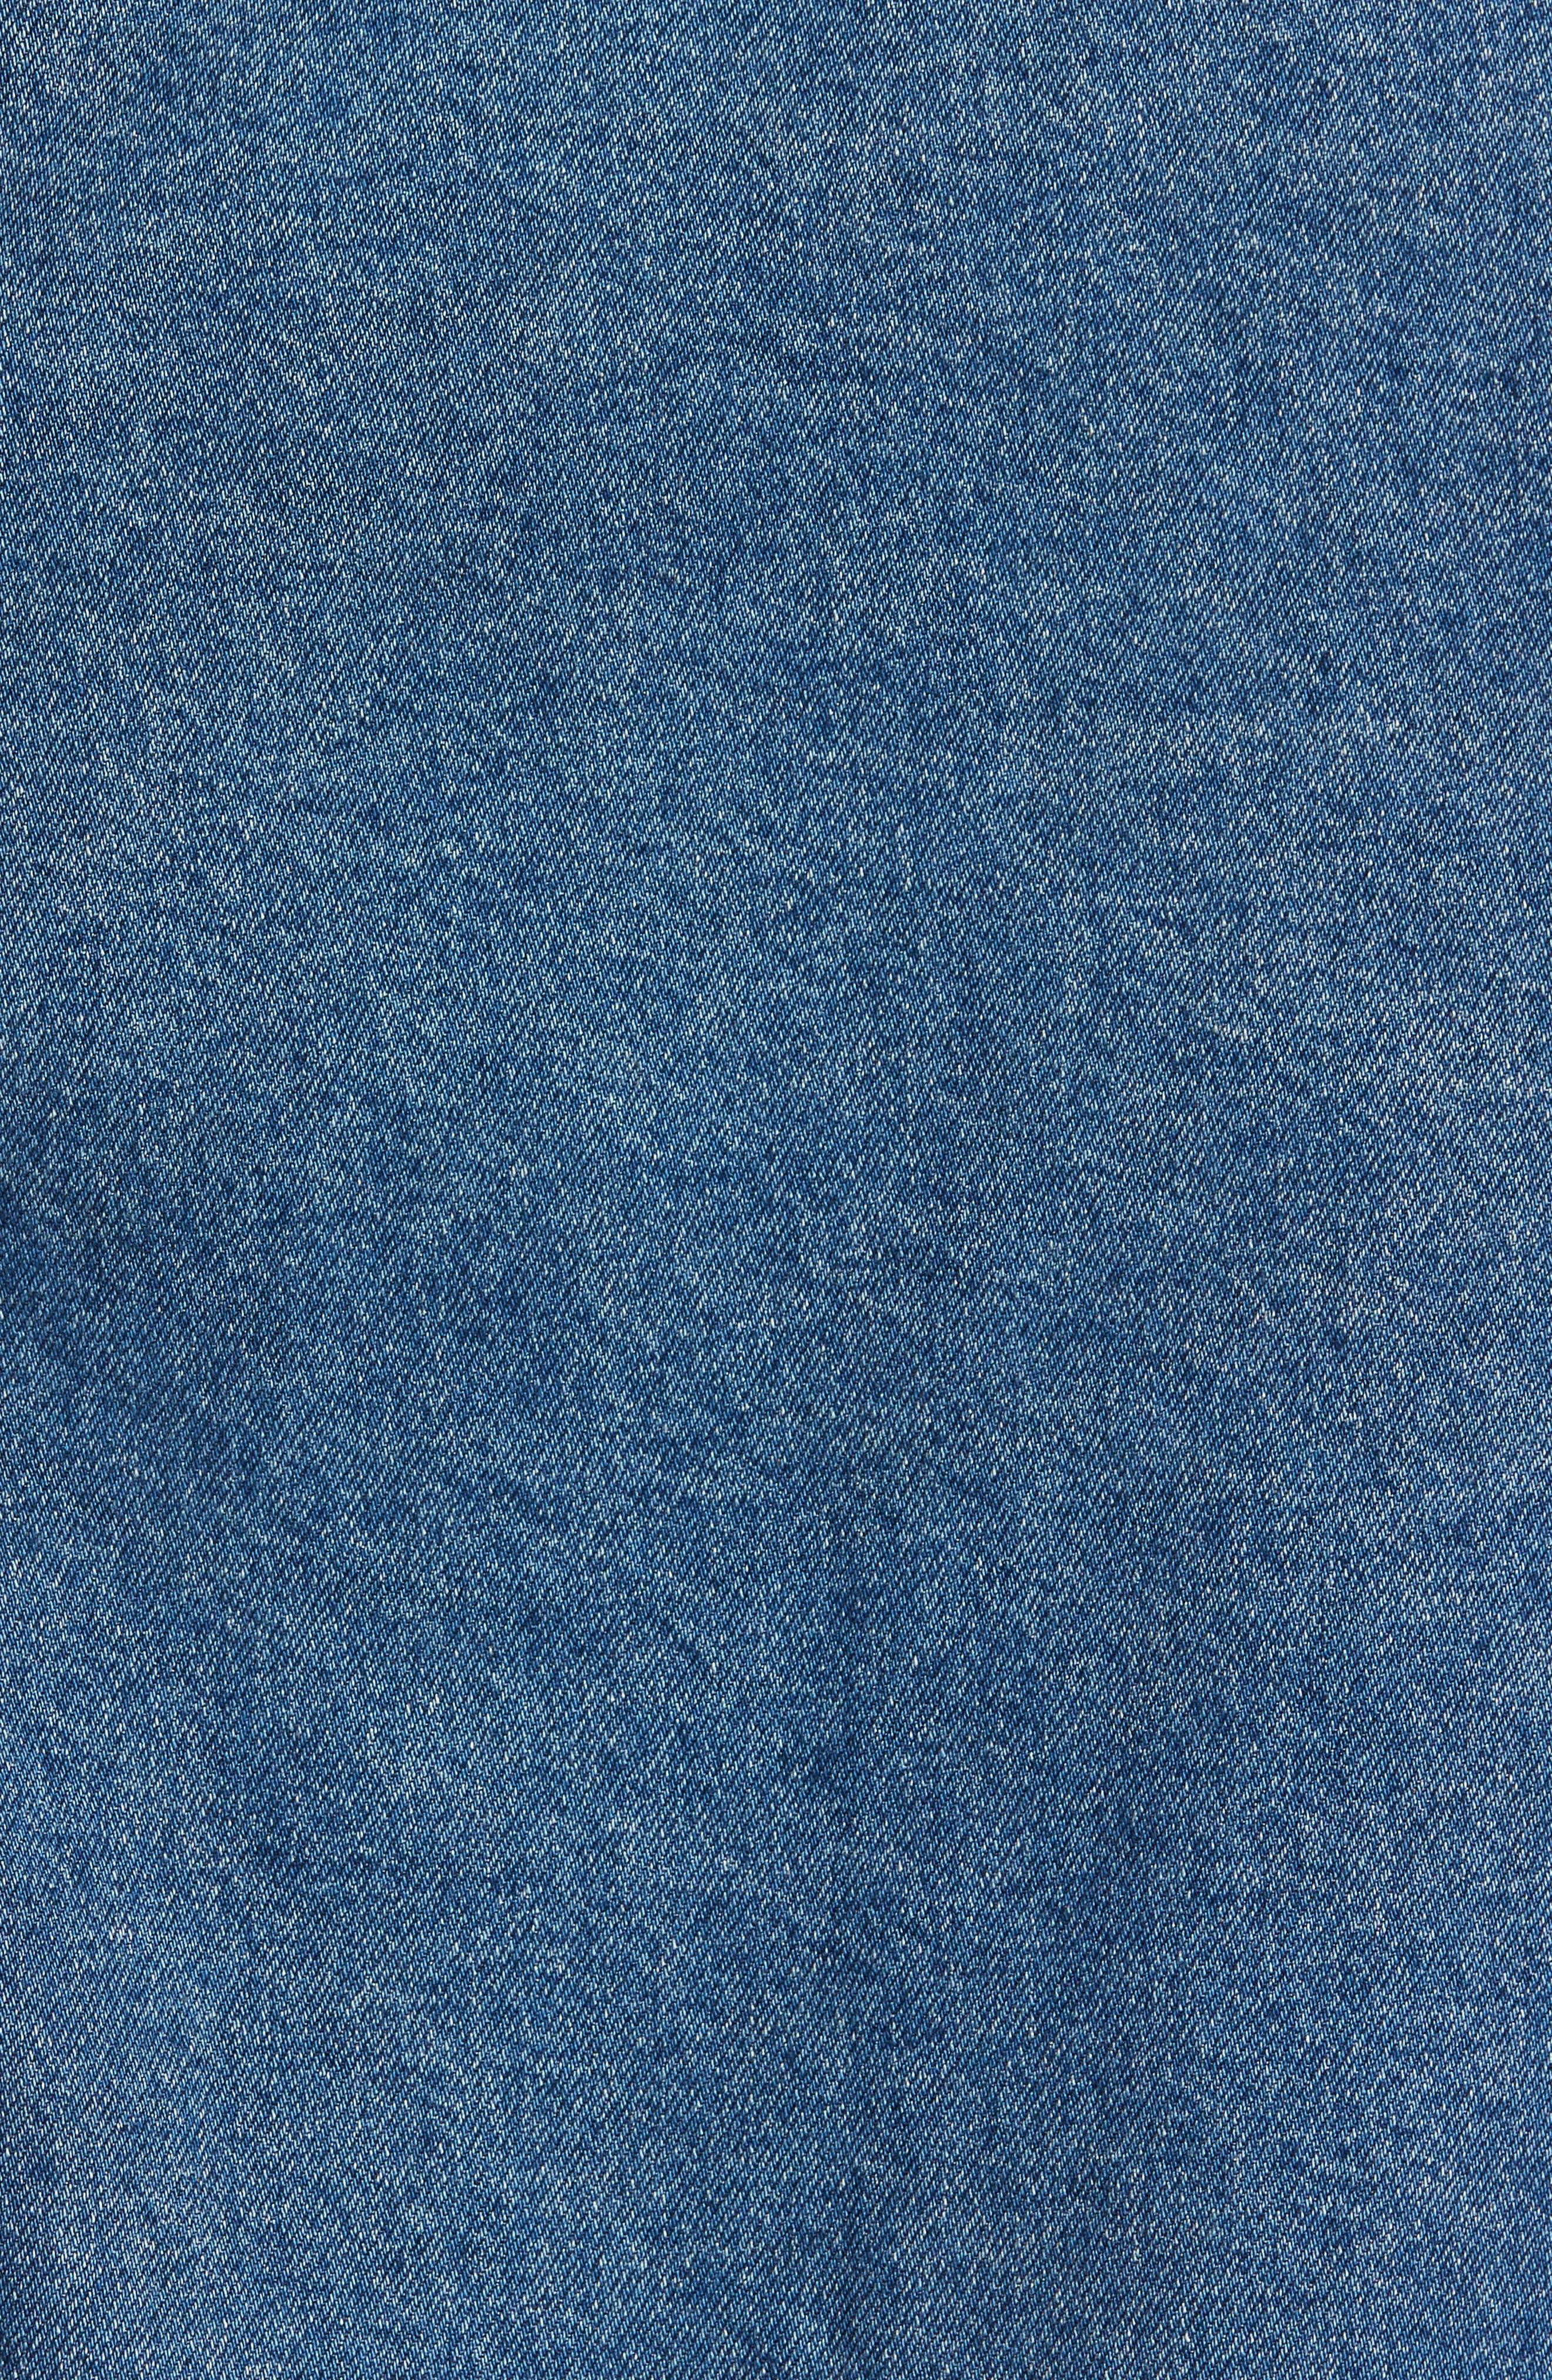 Mid Wash Denim Jacket,                             Alternate thumbnail 7, color,                             420